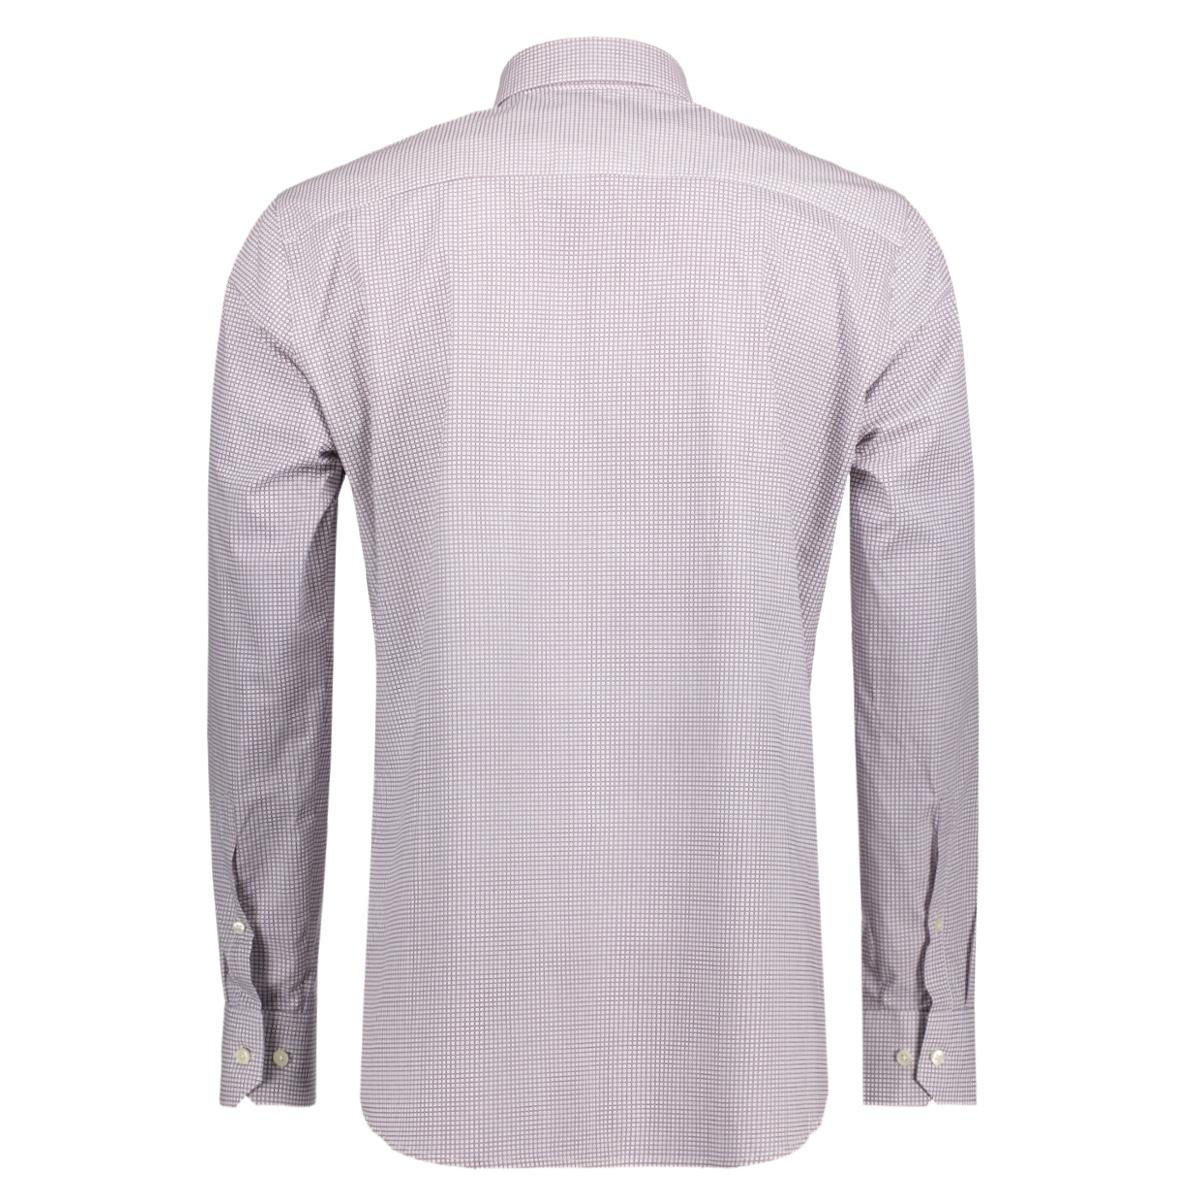 3370 7008 haupt overhemd 02